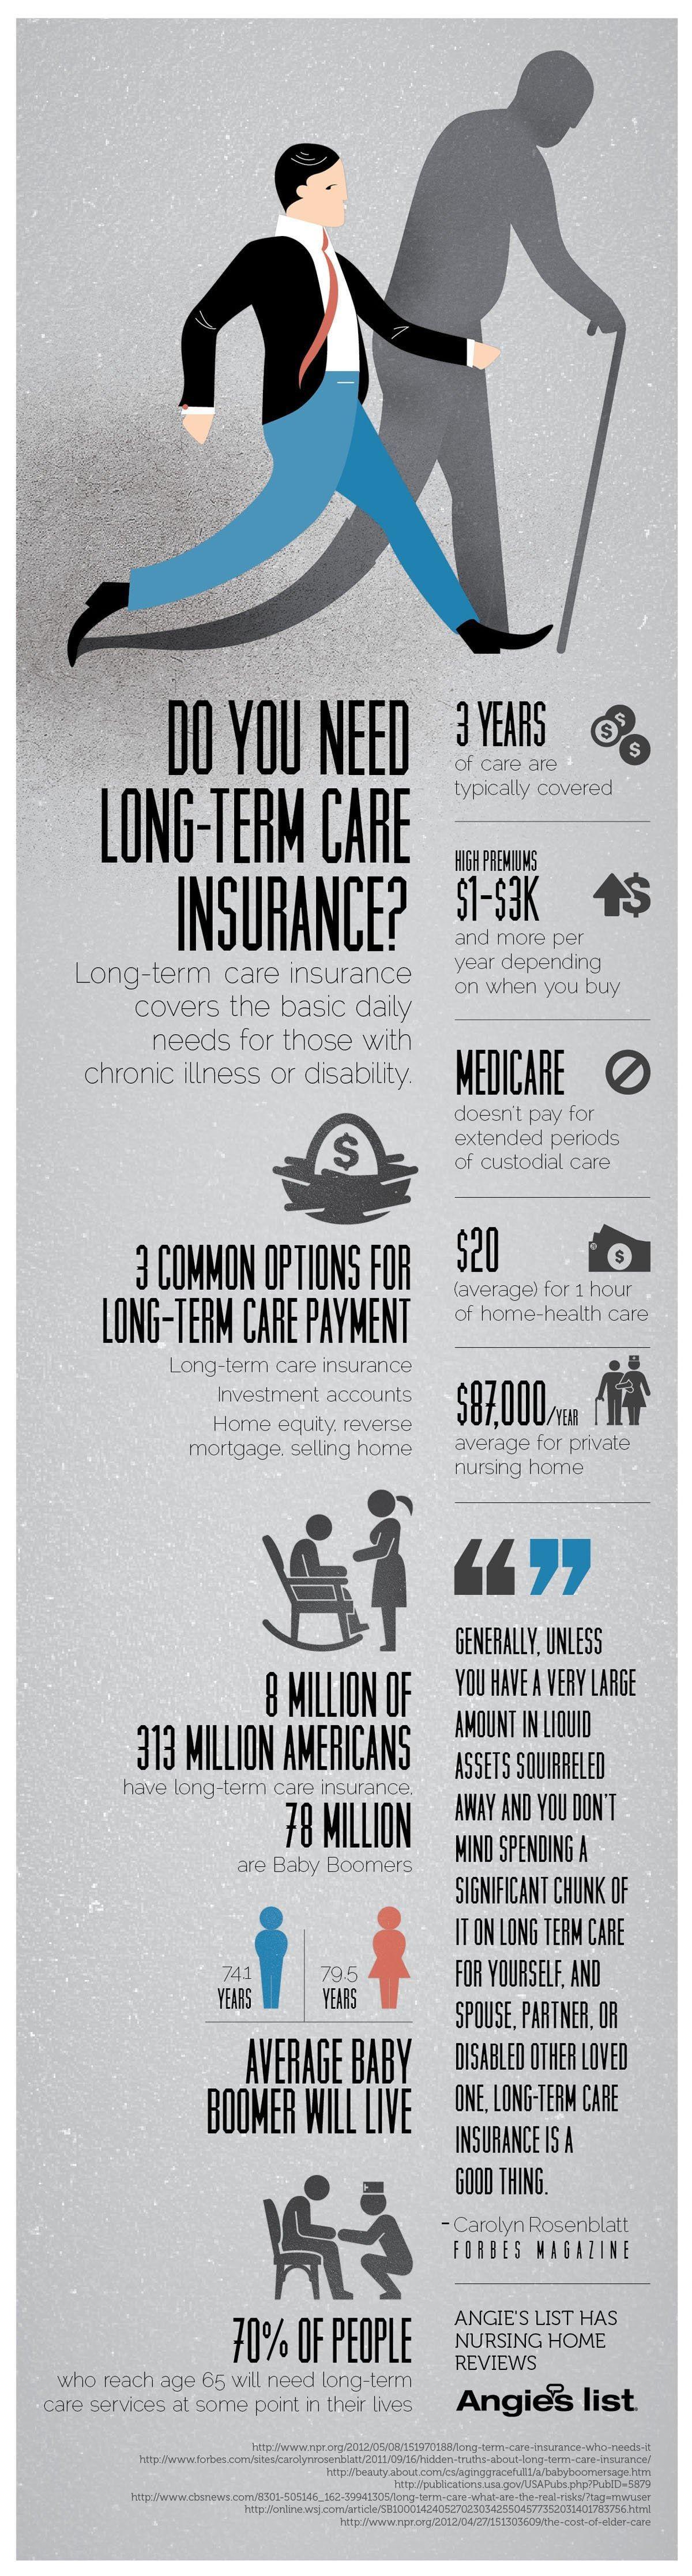 Do you need long term care insurance longtermcare